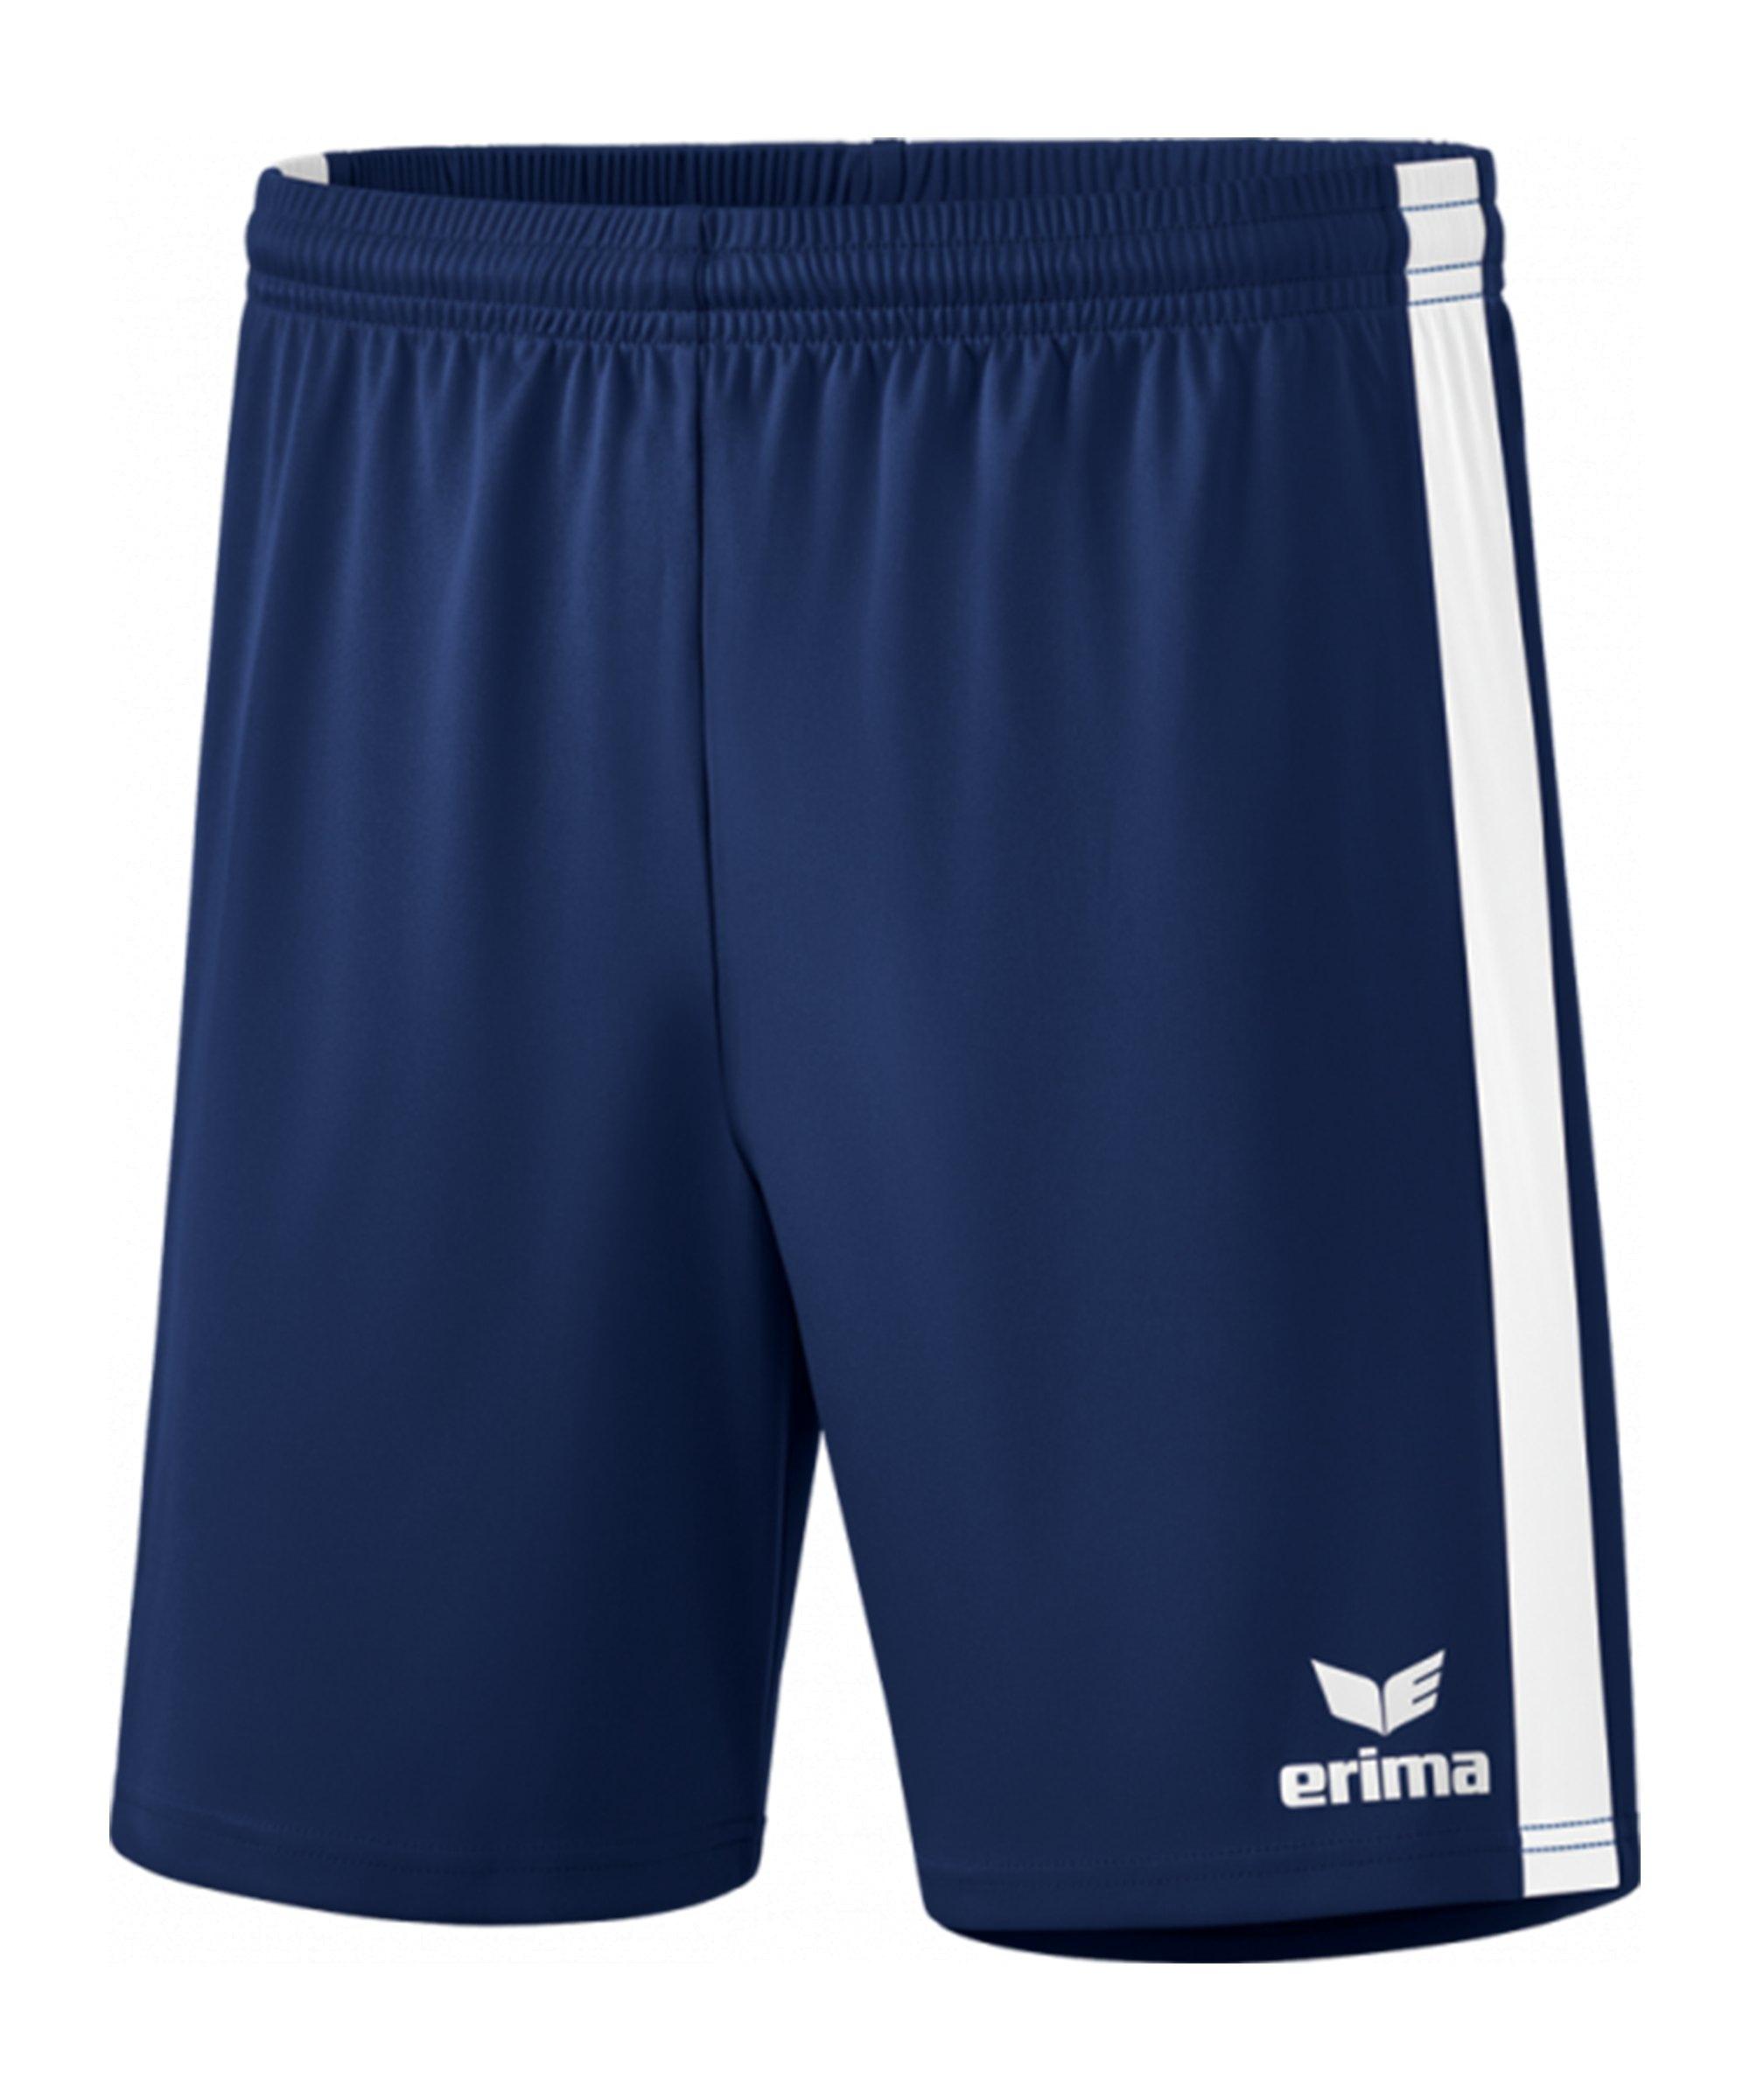 Erima Retro Star Short Blau Weiss - blau